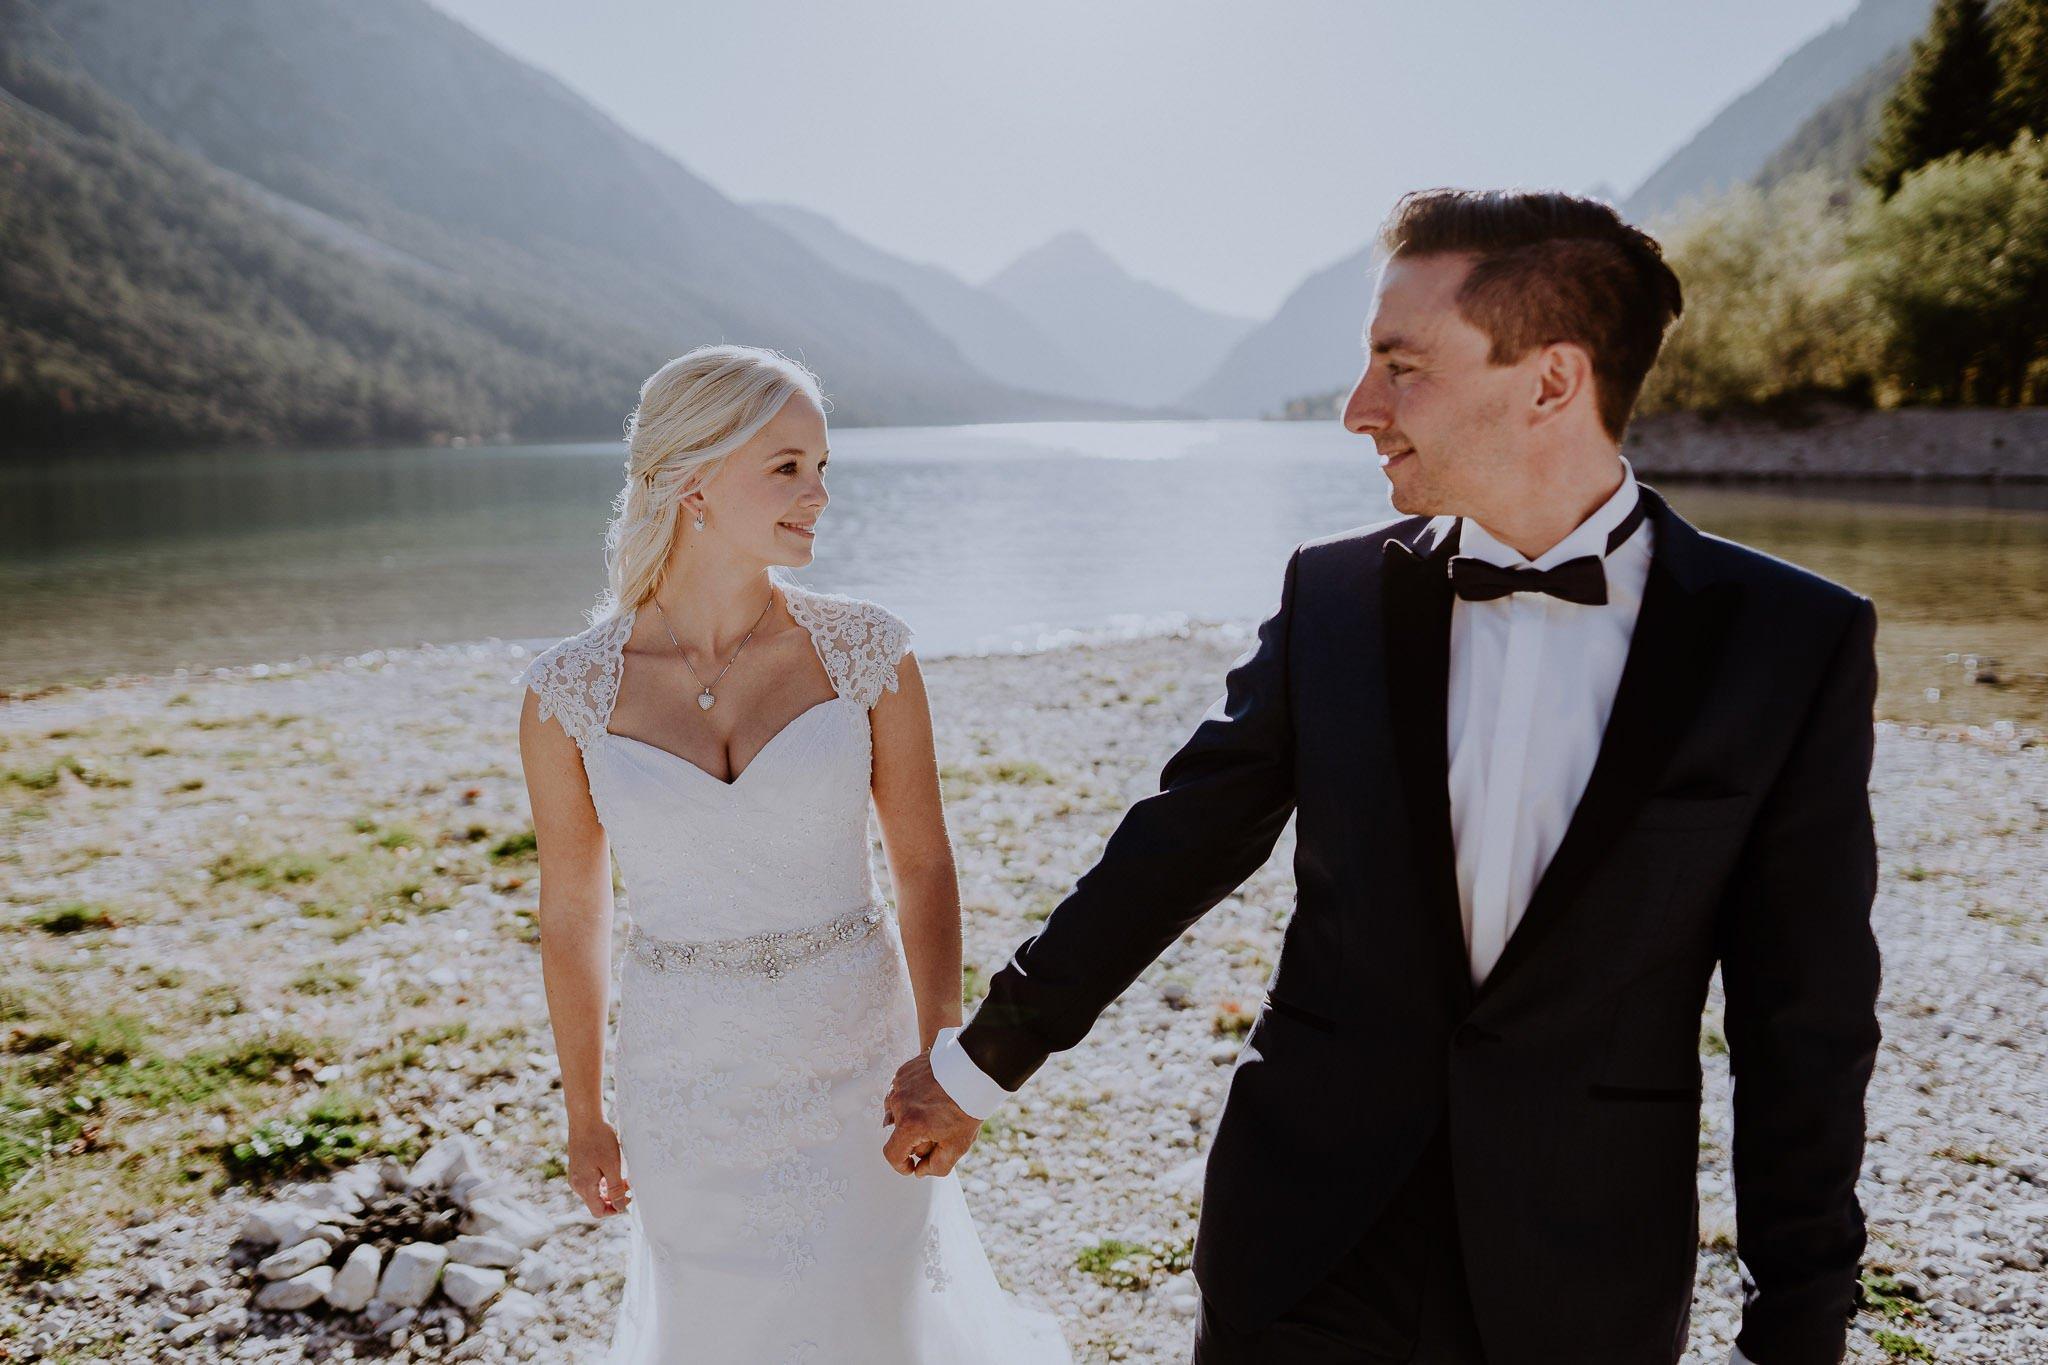 wedding photographer hamilton new zealand 5